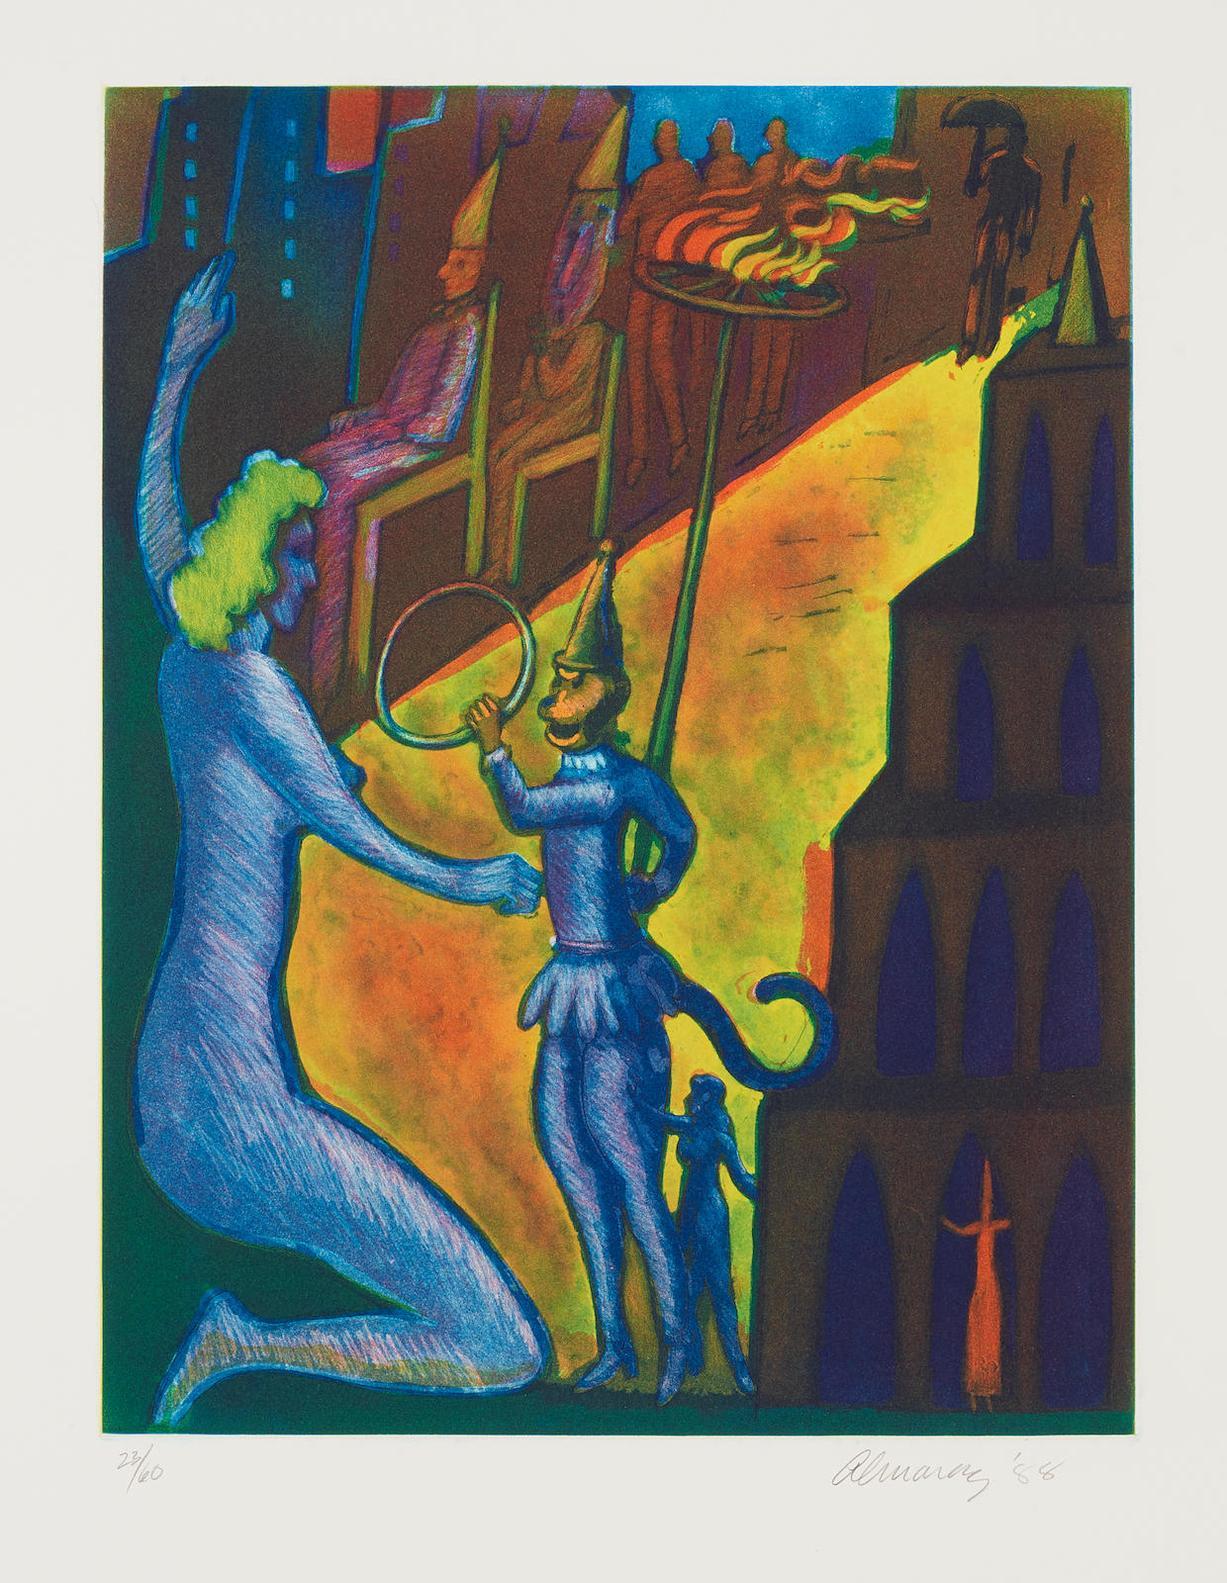 Carlos Almaraz-The Citadel-1988